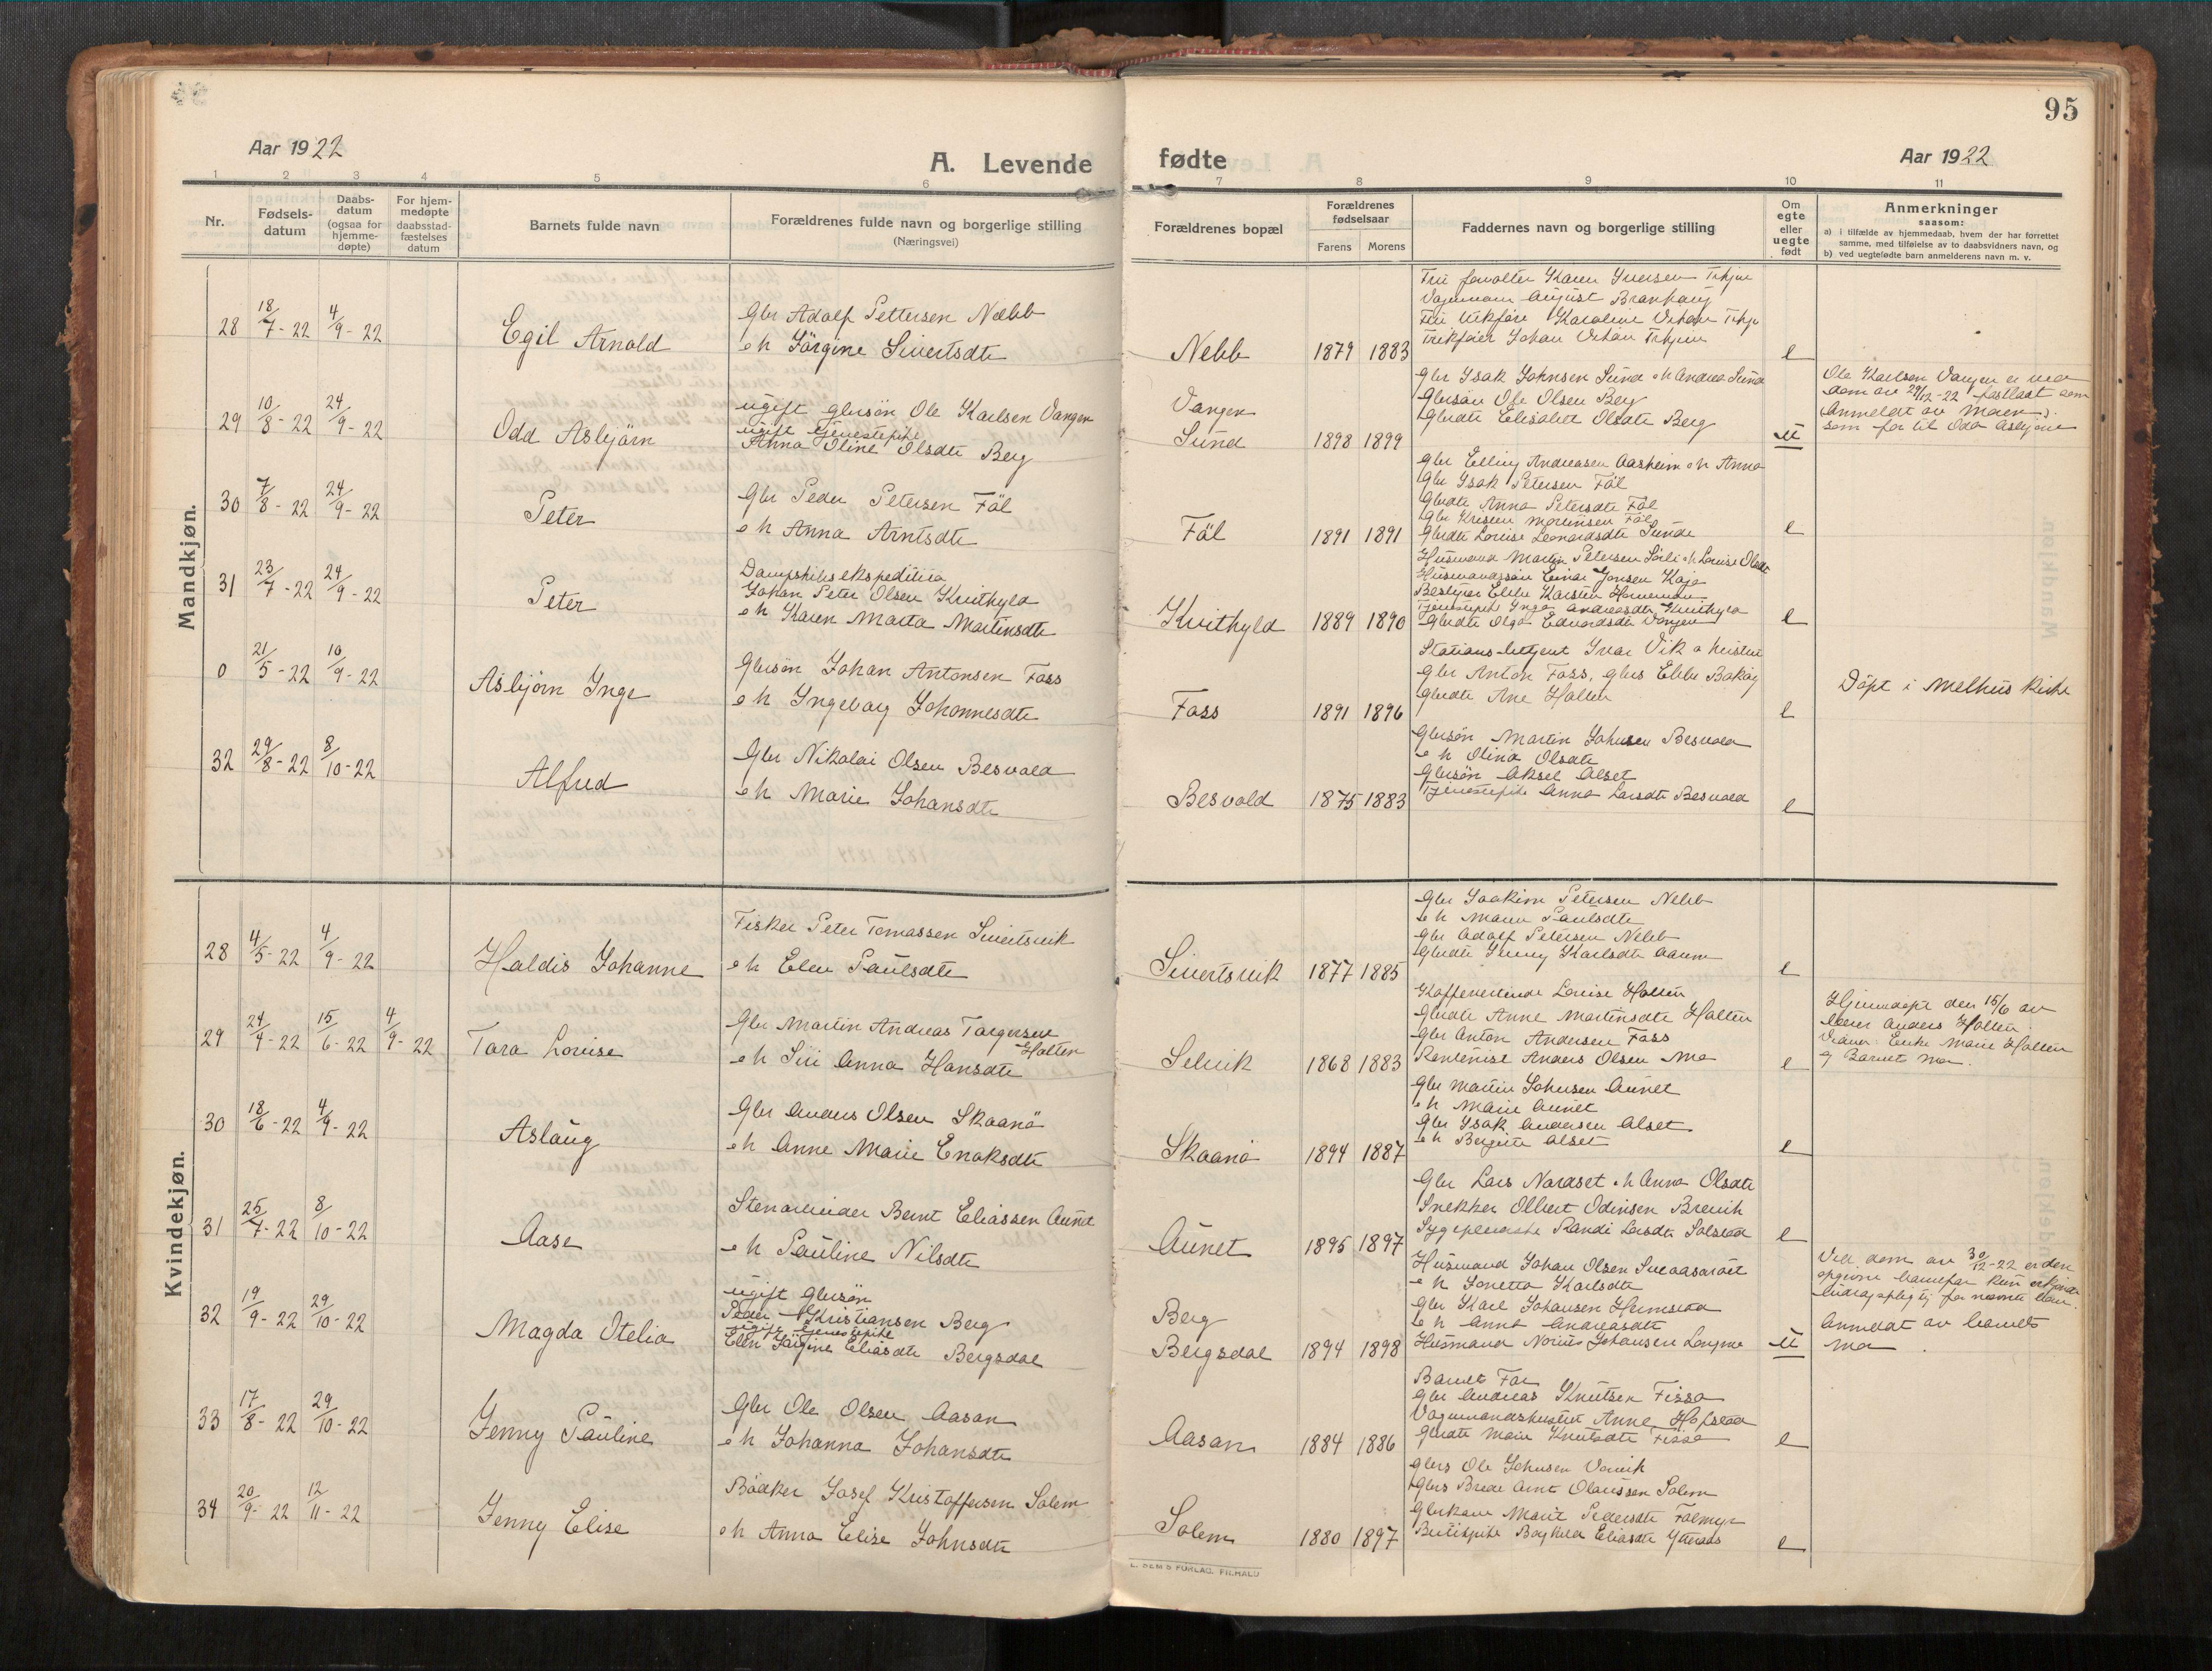 SAT, Stadsbygd sokneprestkontor, I/I1/I1a/L0001: Ministerialbok nr. 1, 1911-1929, s. 95